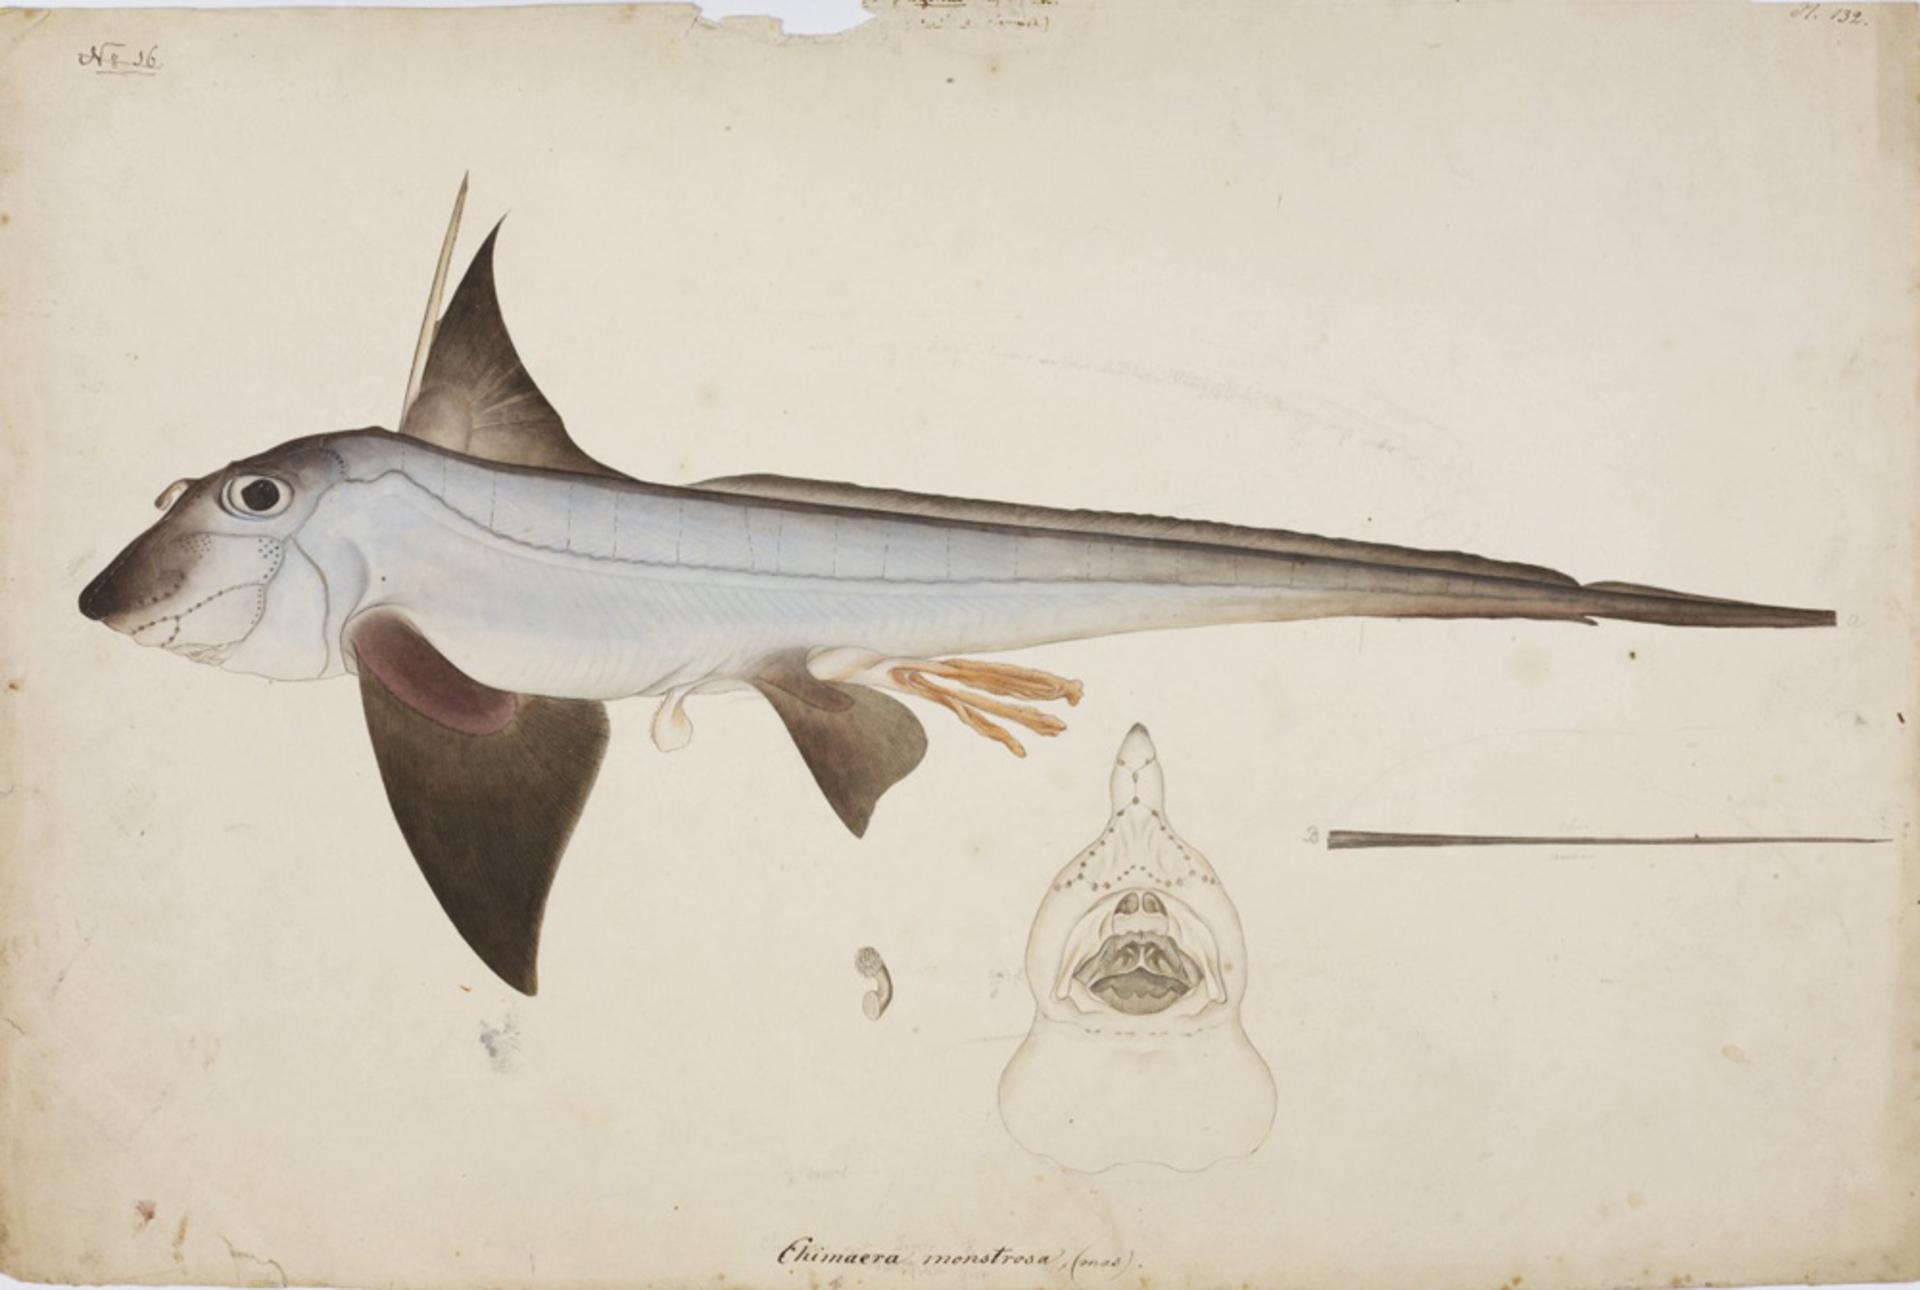 RMNH.ART.44 | Chimaera phantasma